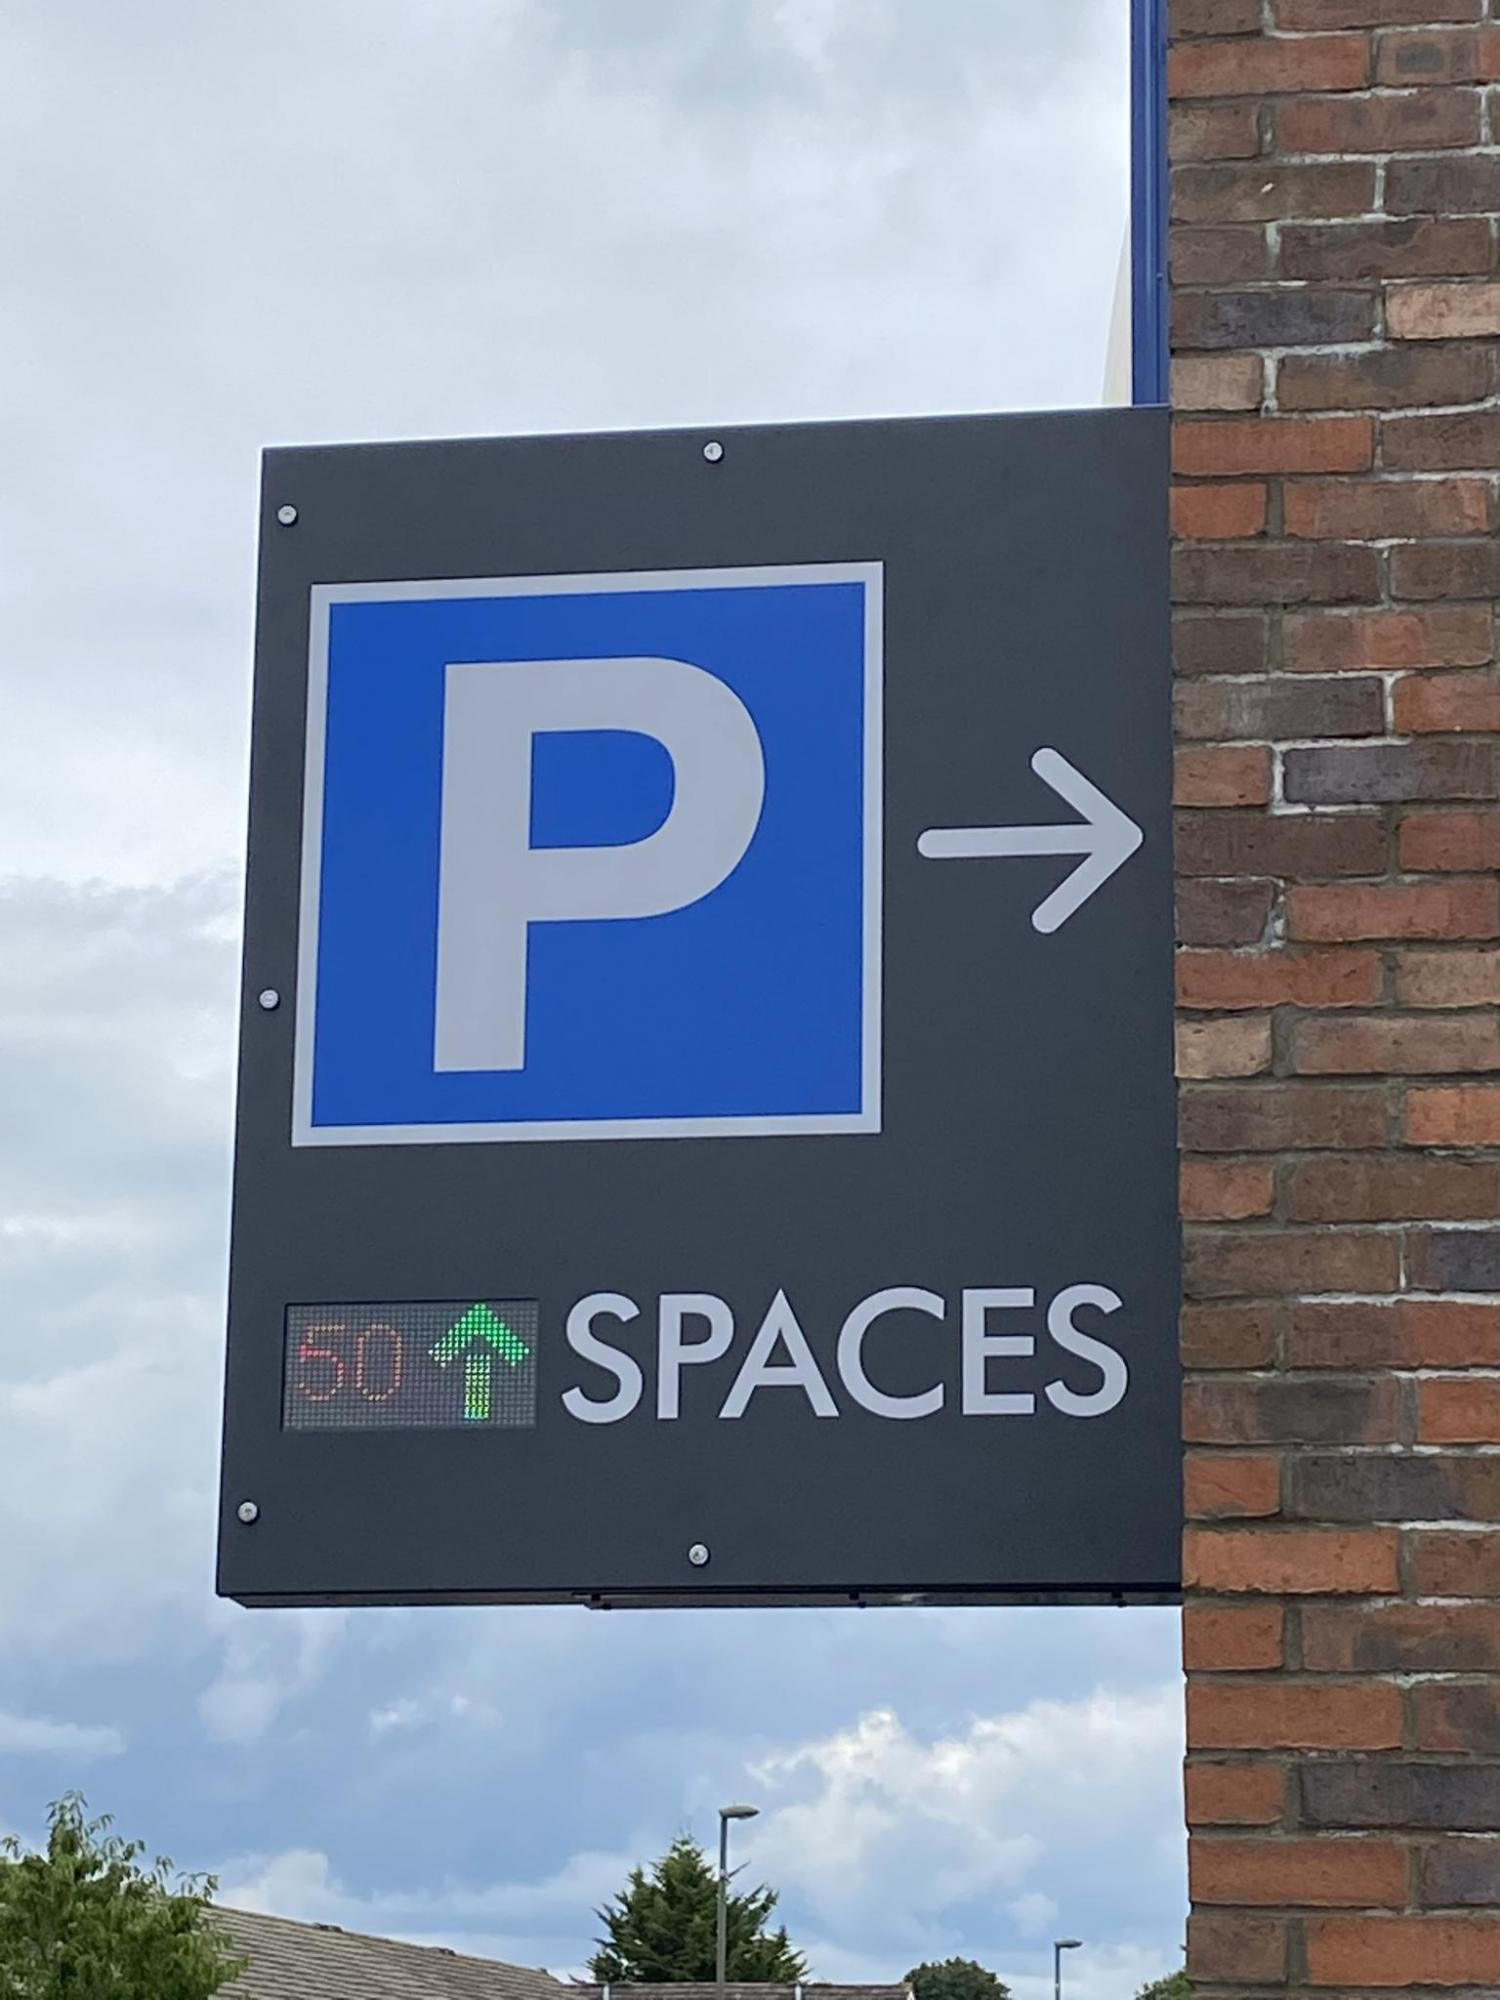 https://www.secureeng.co.uk/wp-content/uploads/2021/10/Spaces-sign.jpg